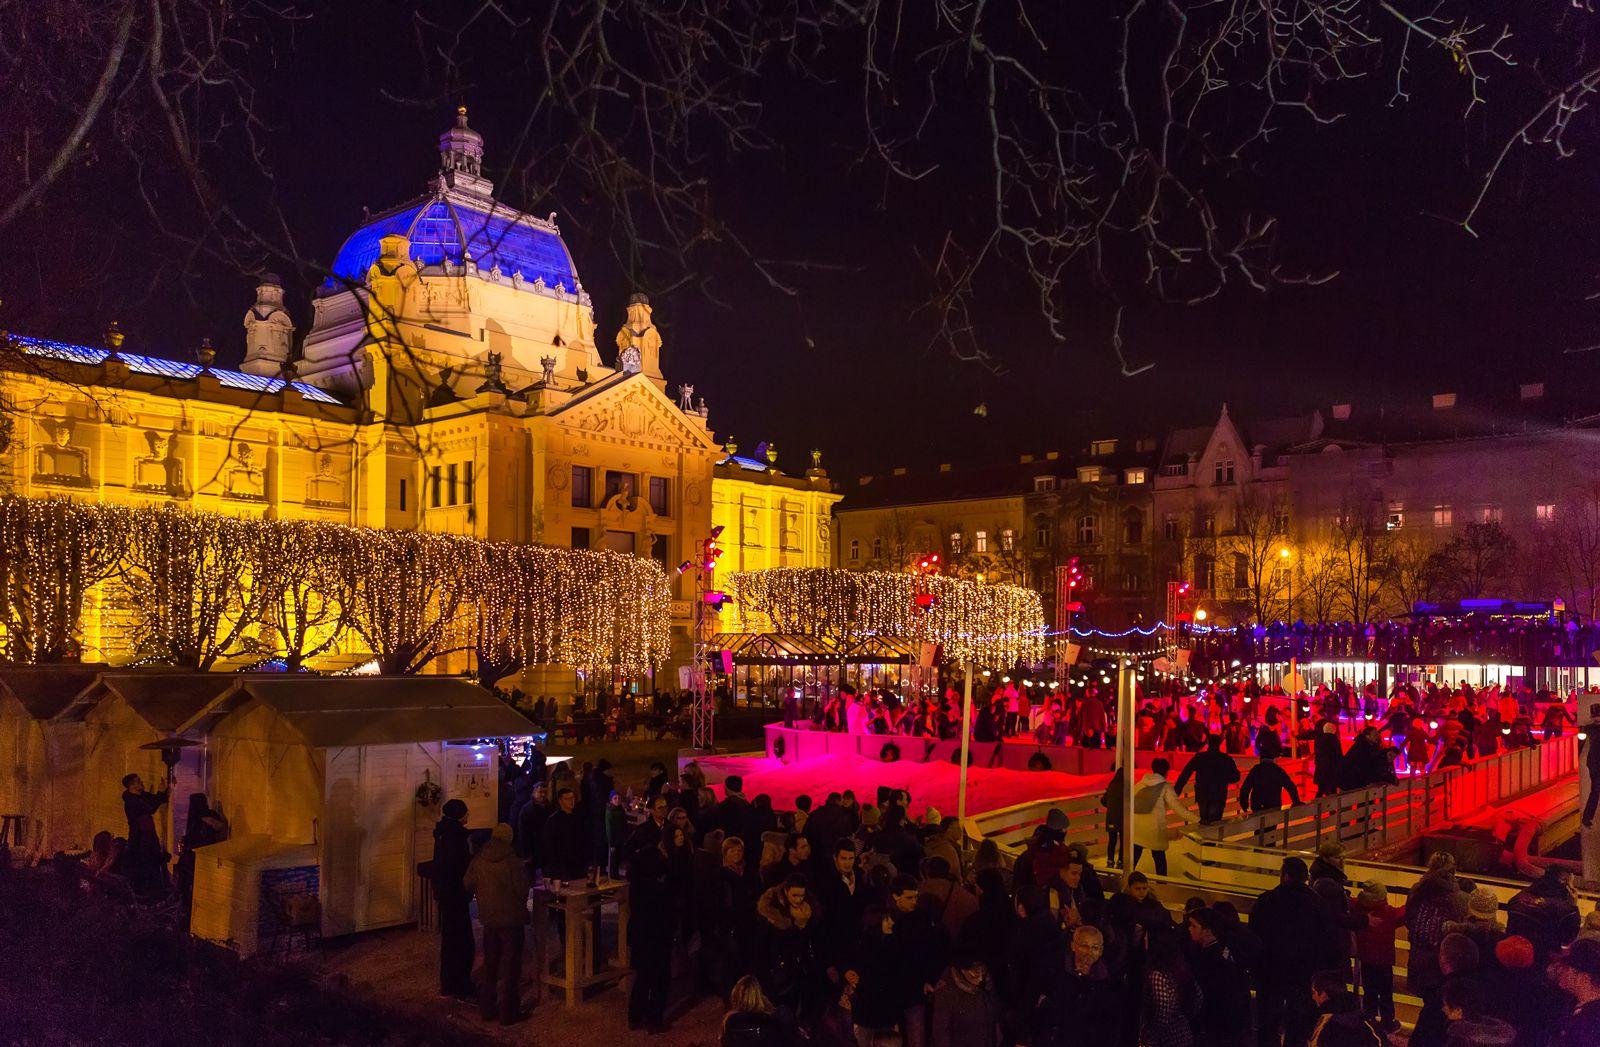 2021/01/Advent-Zagreb-5.jpg